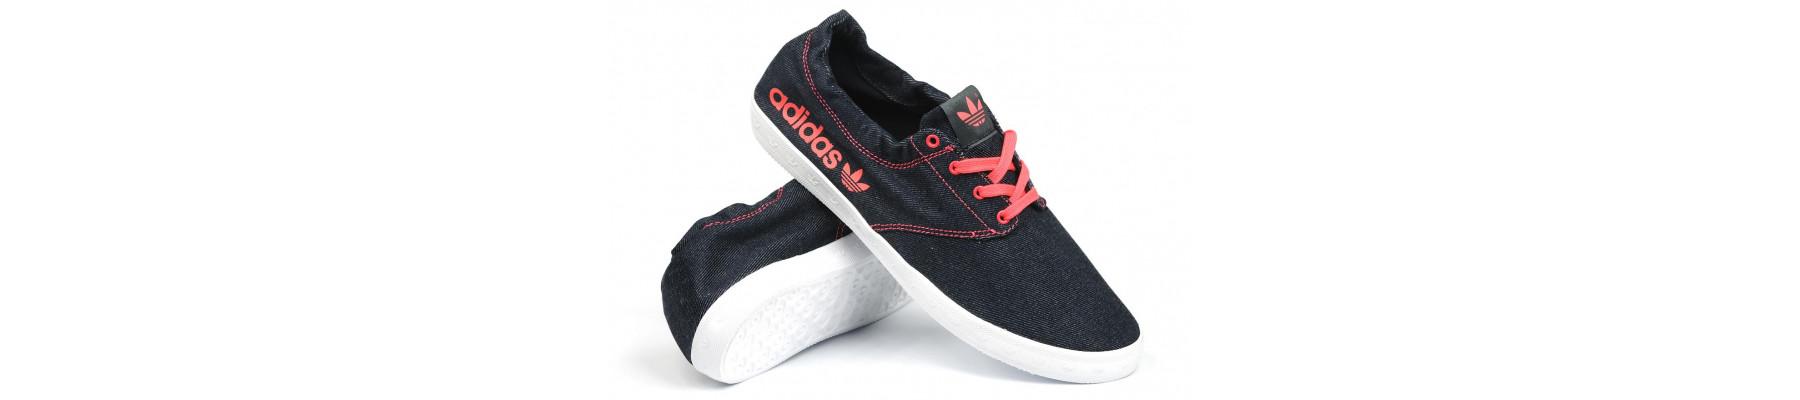 Adidas Adria Light